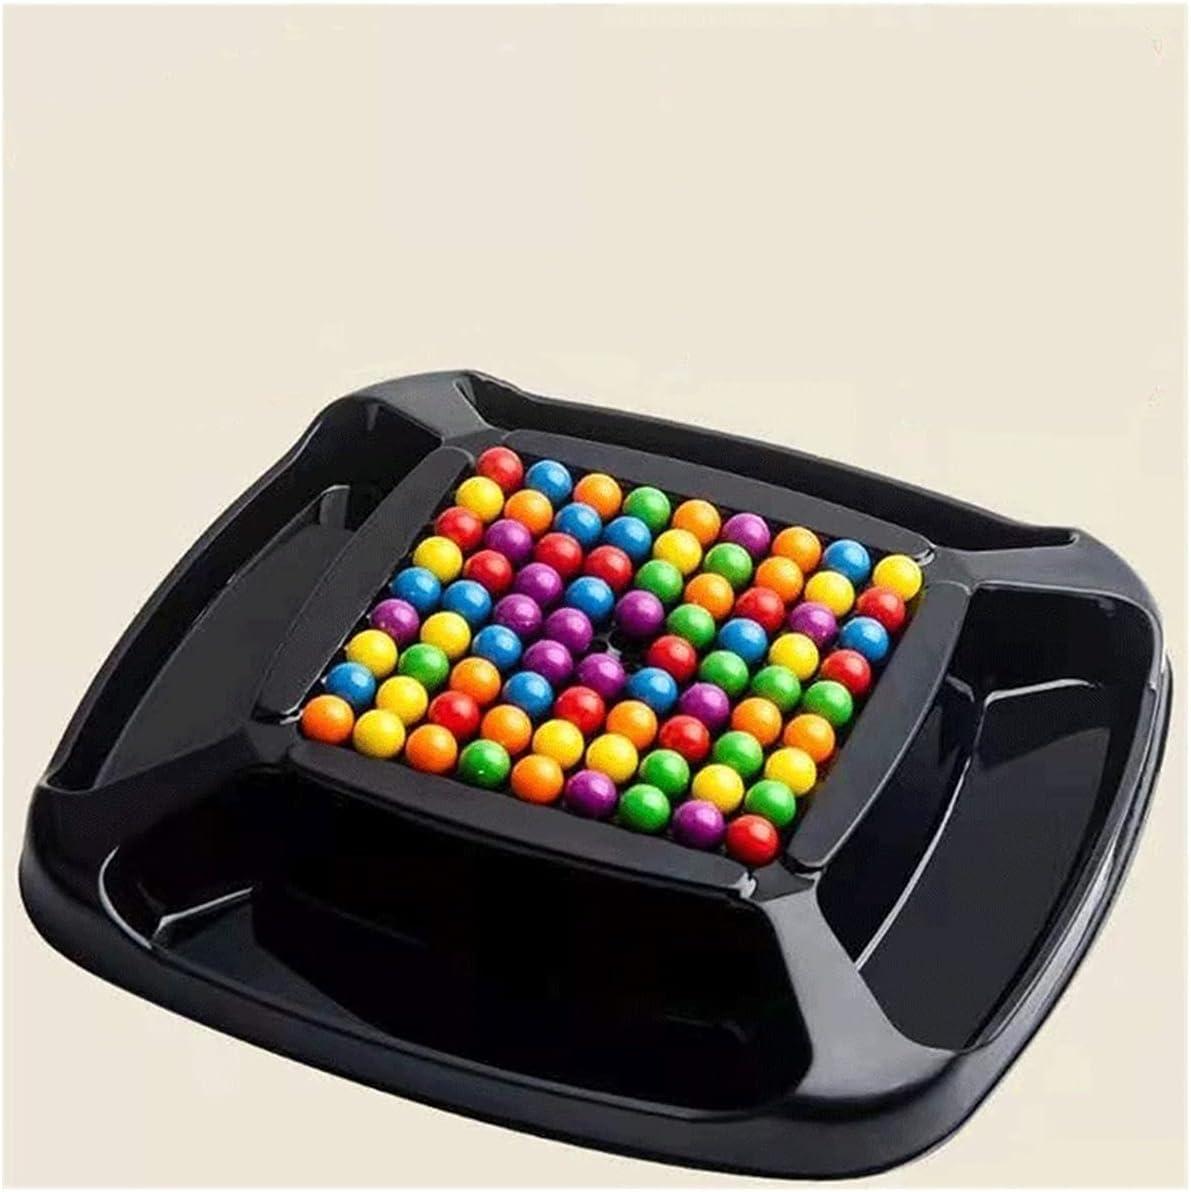 Z-Color Max 78% OFF Children's Elimination of Fun Regular store Games Paren Table Puzzle